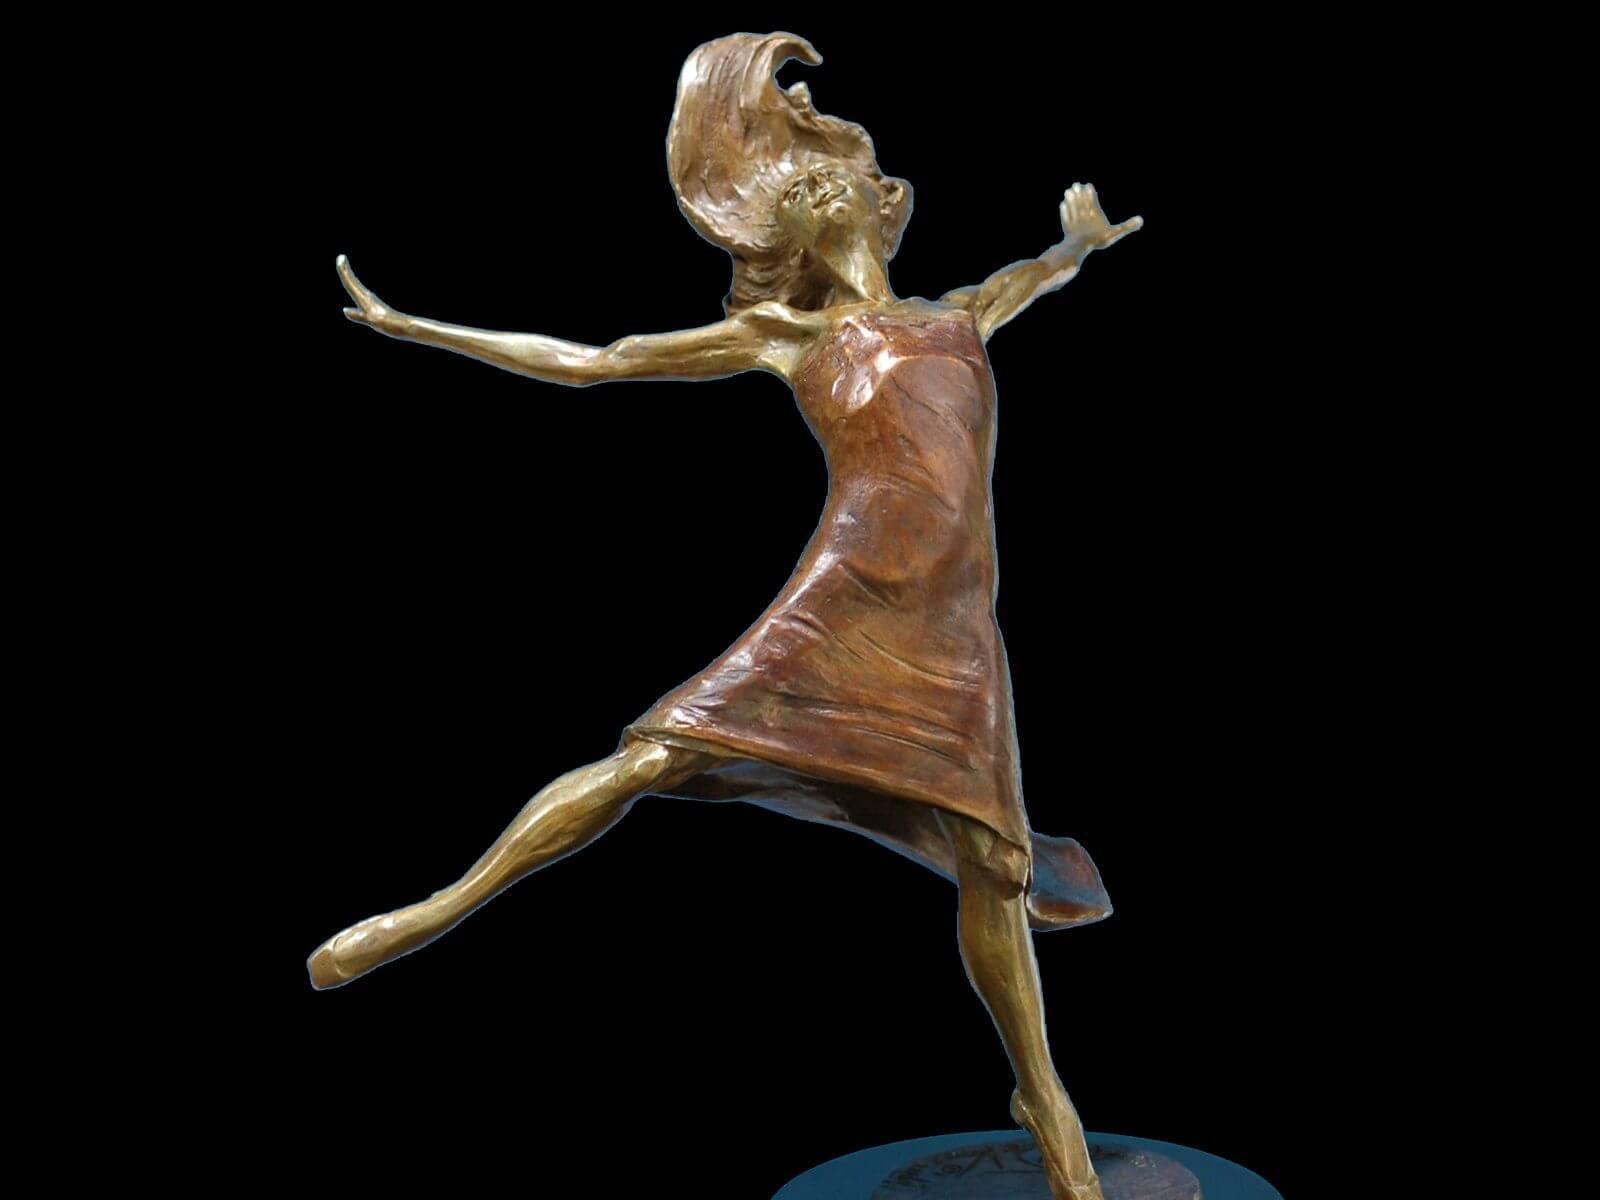 Rhapsody a medium size ballet dancer bronze figurative sculpture by Andrew DeVries